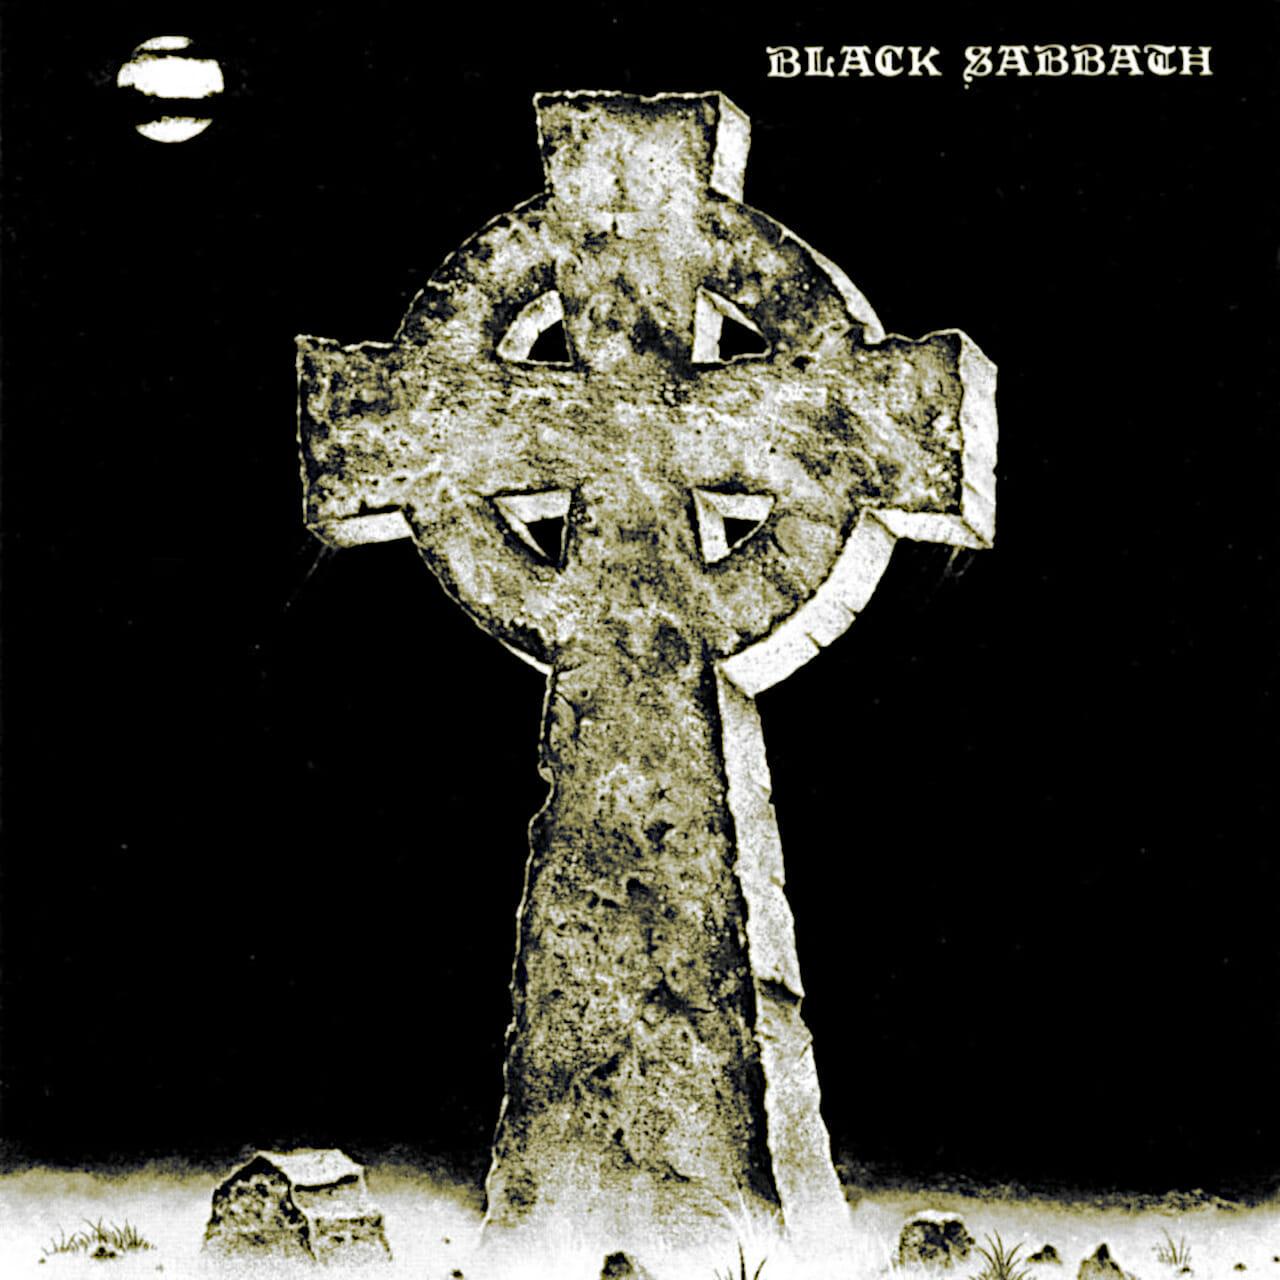 Black Sabbath - Cruz sin cabeza